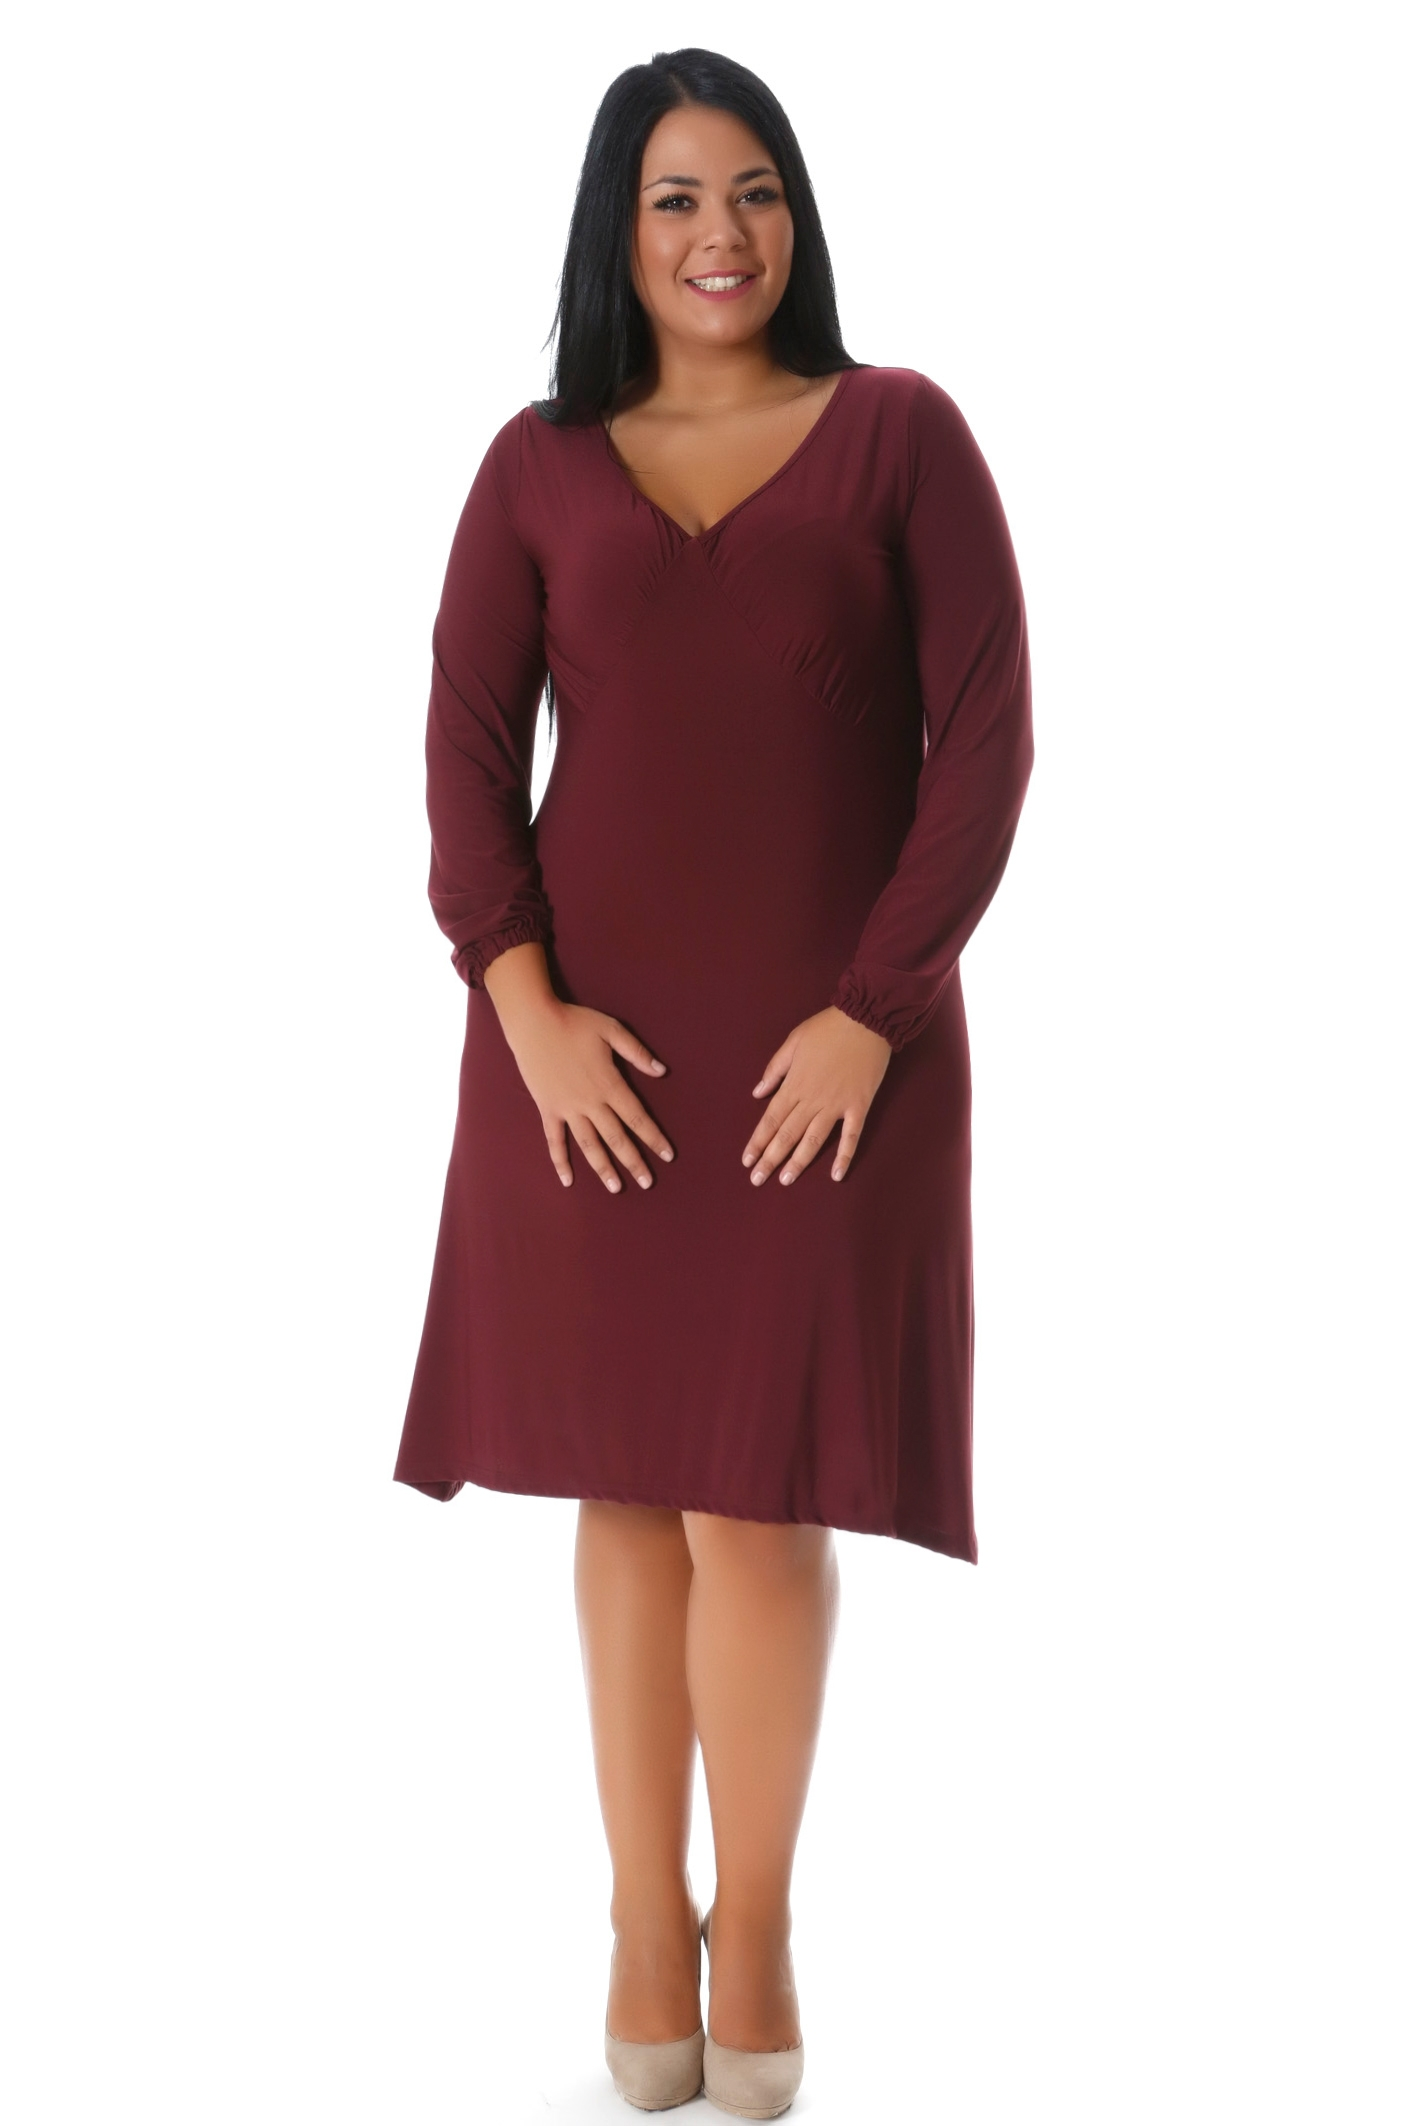 Midi φόρεμα μπορντώ νέες αφίξεις   ενδύματα   φορέματα   sunrose   brands